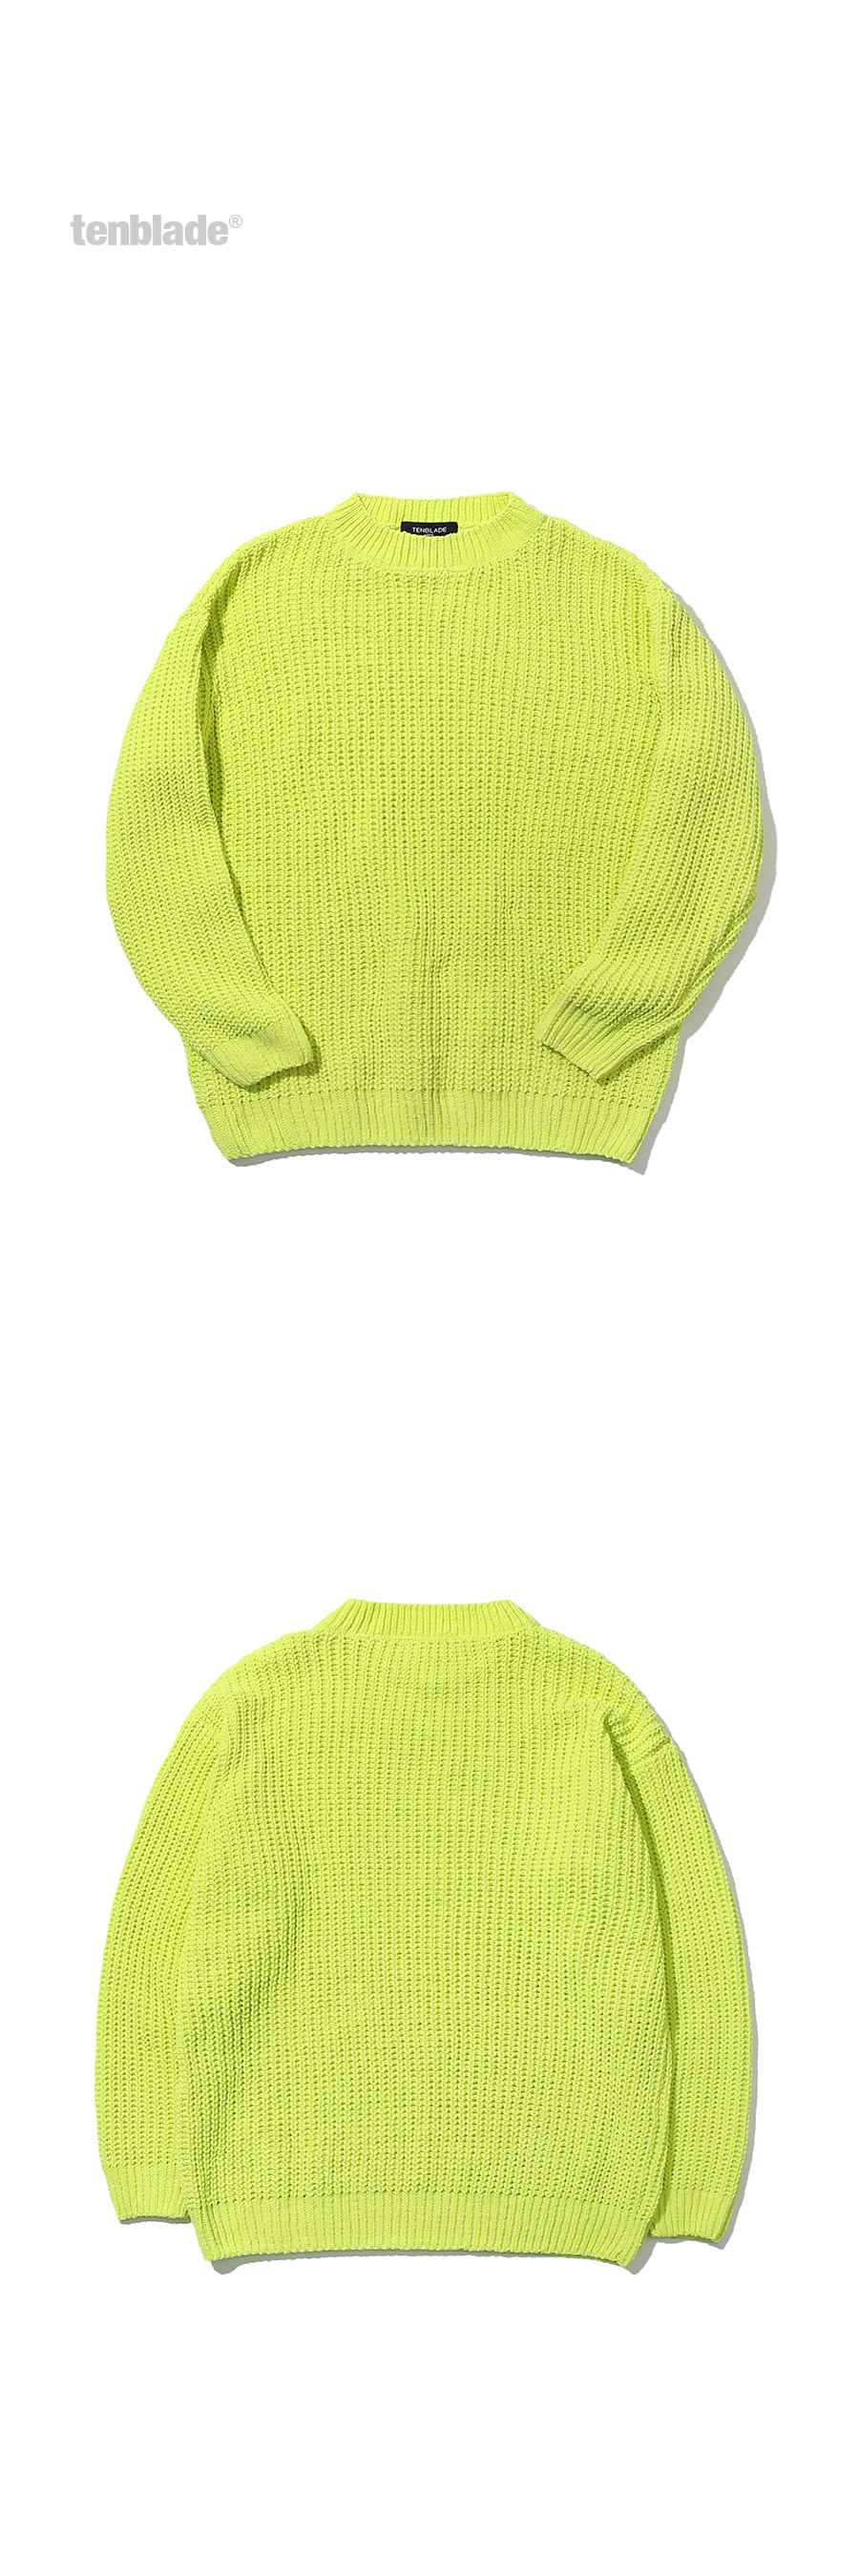 tai551kt-neon-green-06.jpg